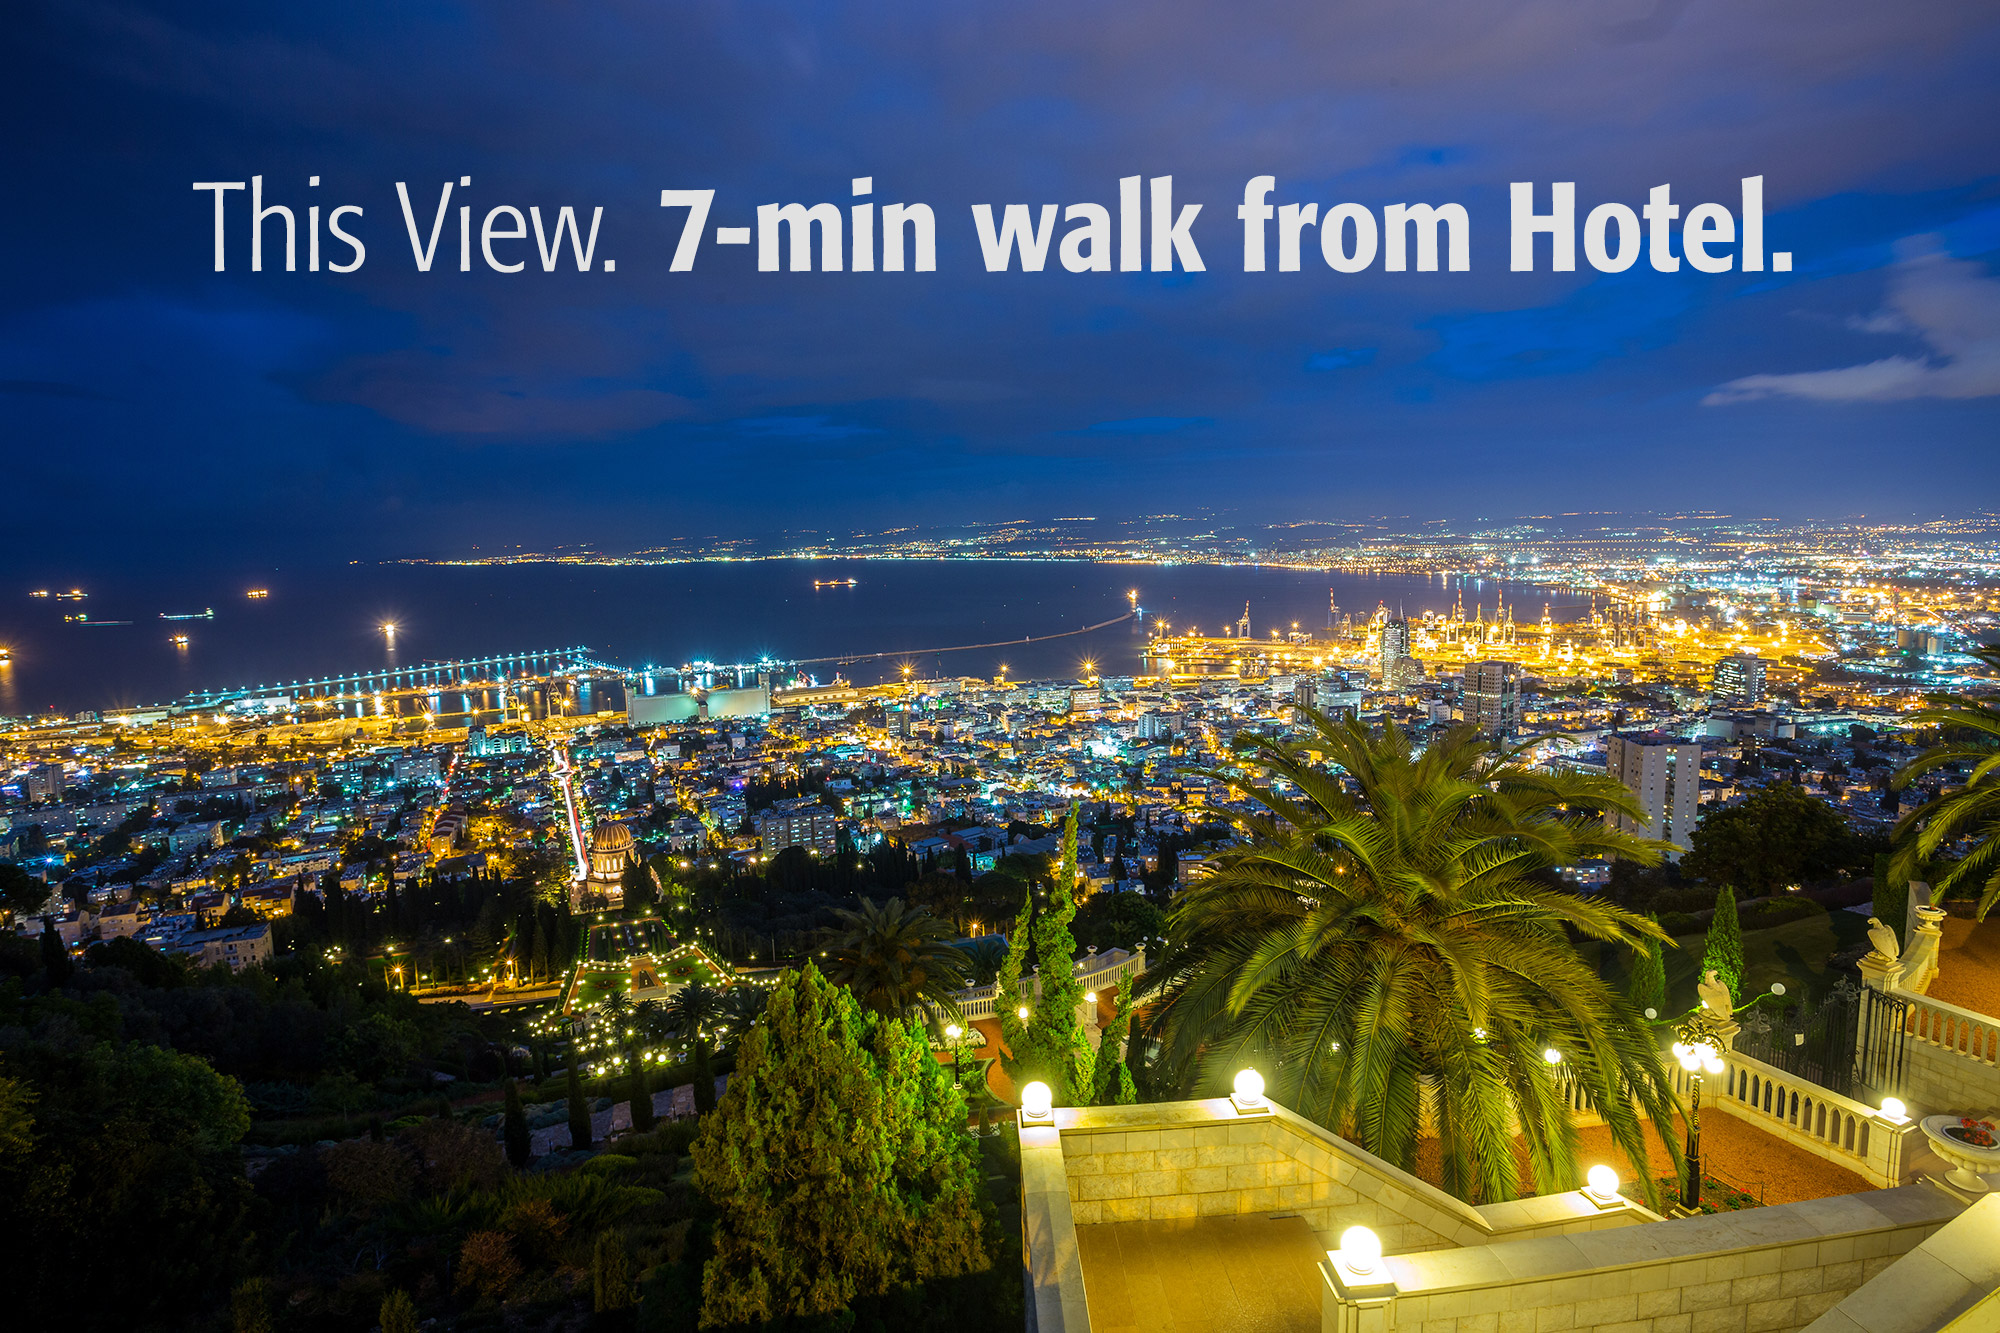 Centrally located Hotel in Haifa Mount Carmel Centrally located